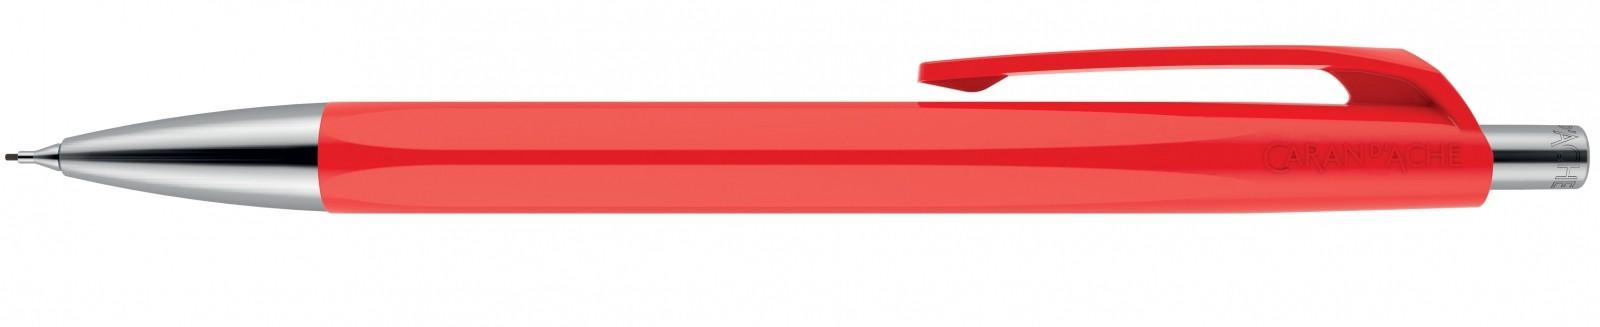 LAPISEIRA 0,7mm 884.570 INFINITE ESCARLATE